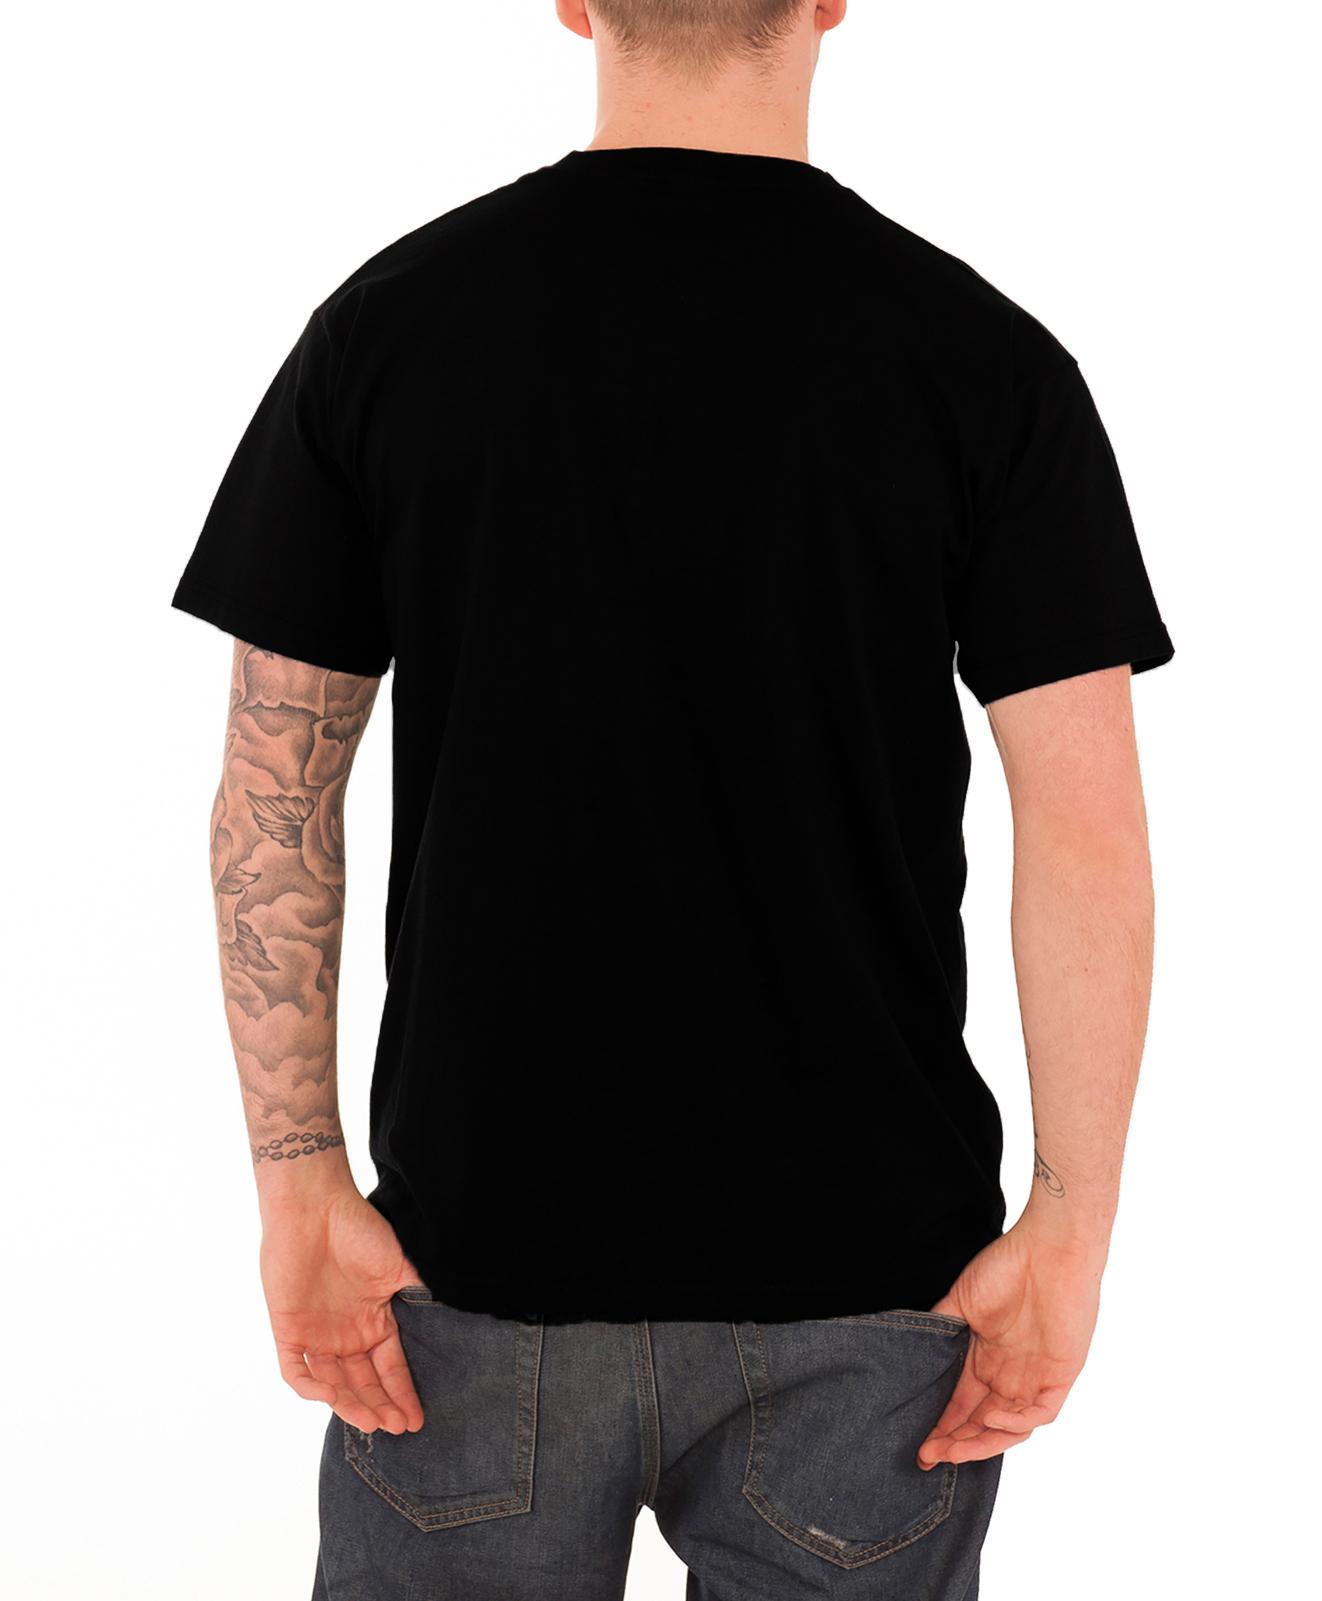 Official-Gas-Monkey-Garage-T-Shirt-Official-GMG-Logo-Kustom-Builds-new-Mens Indexbild 31